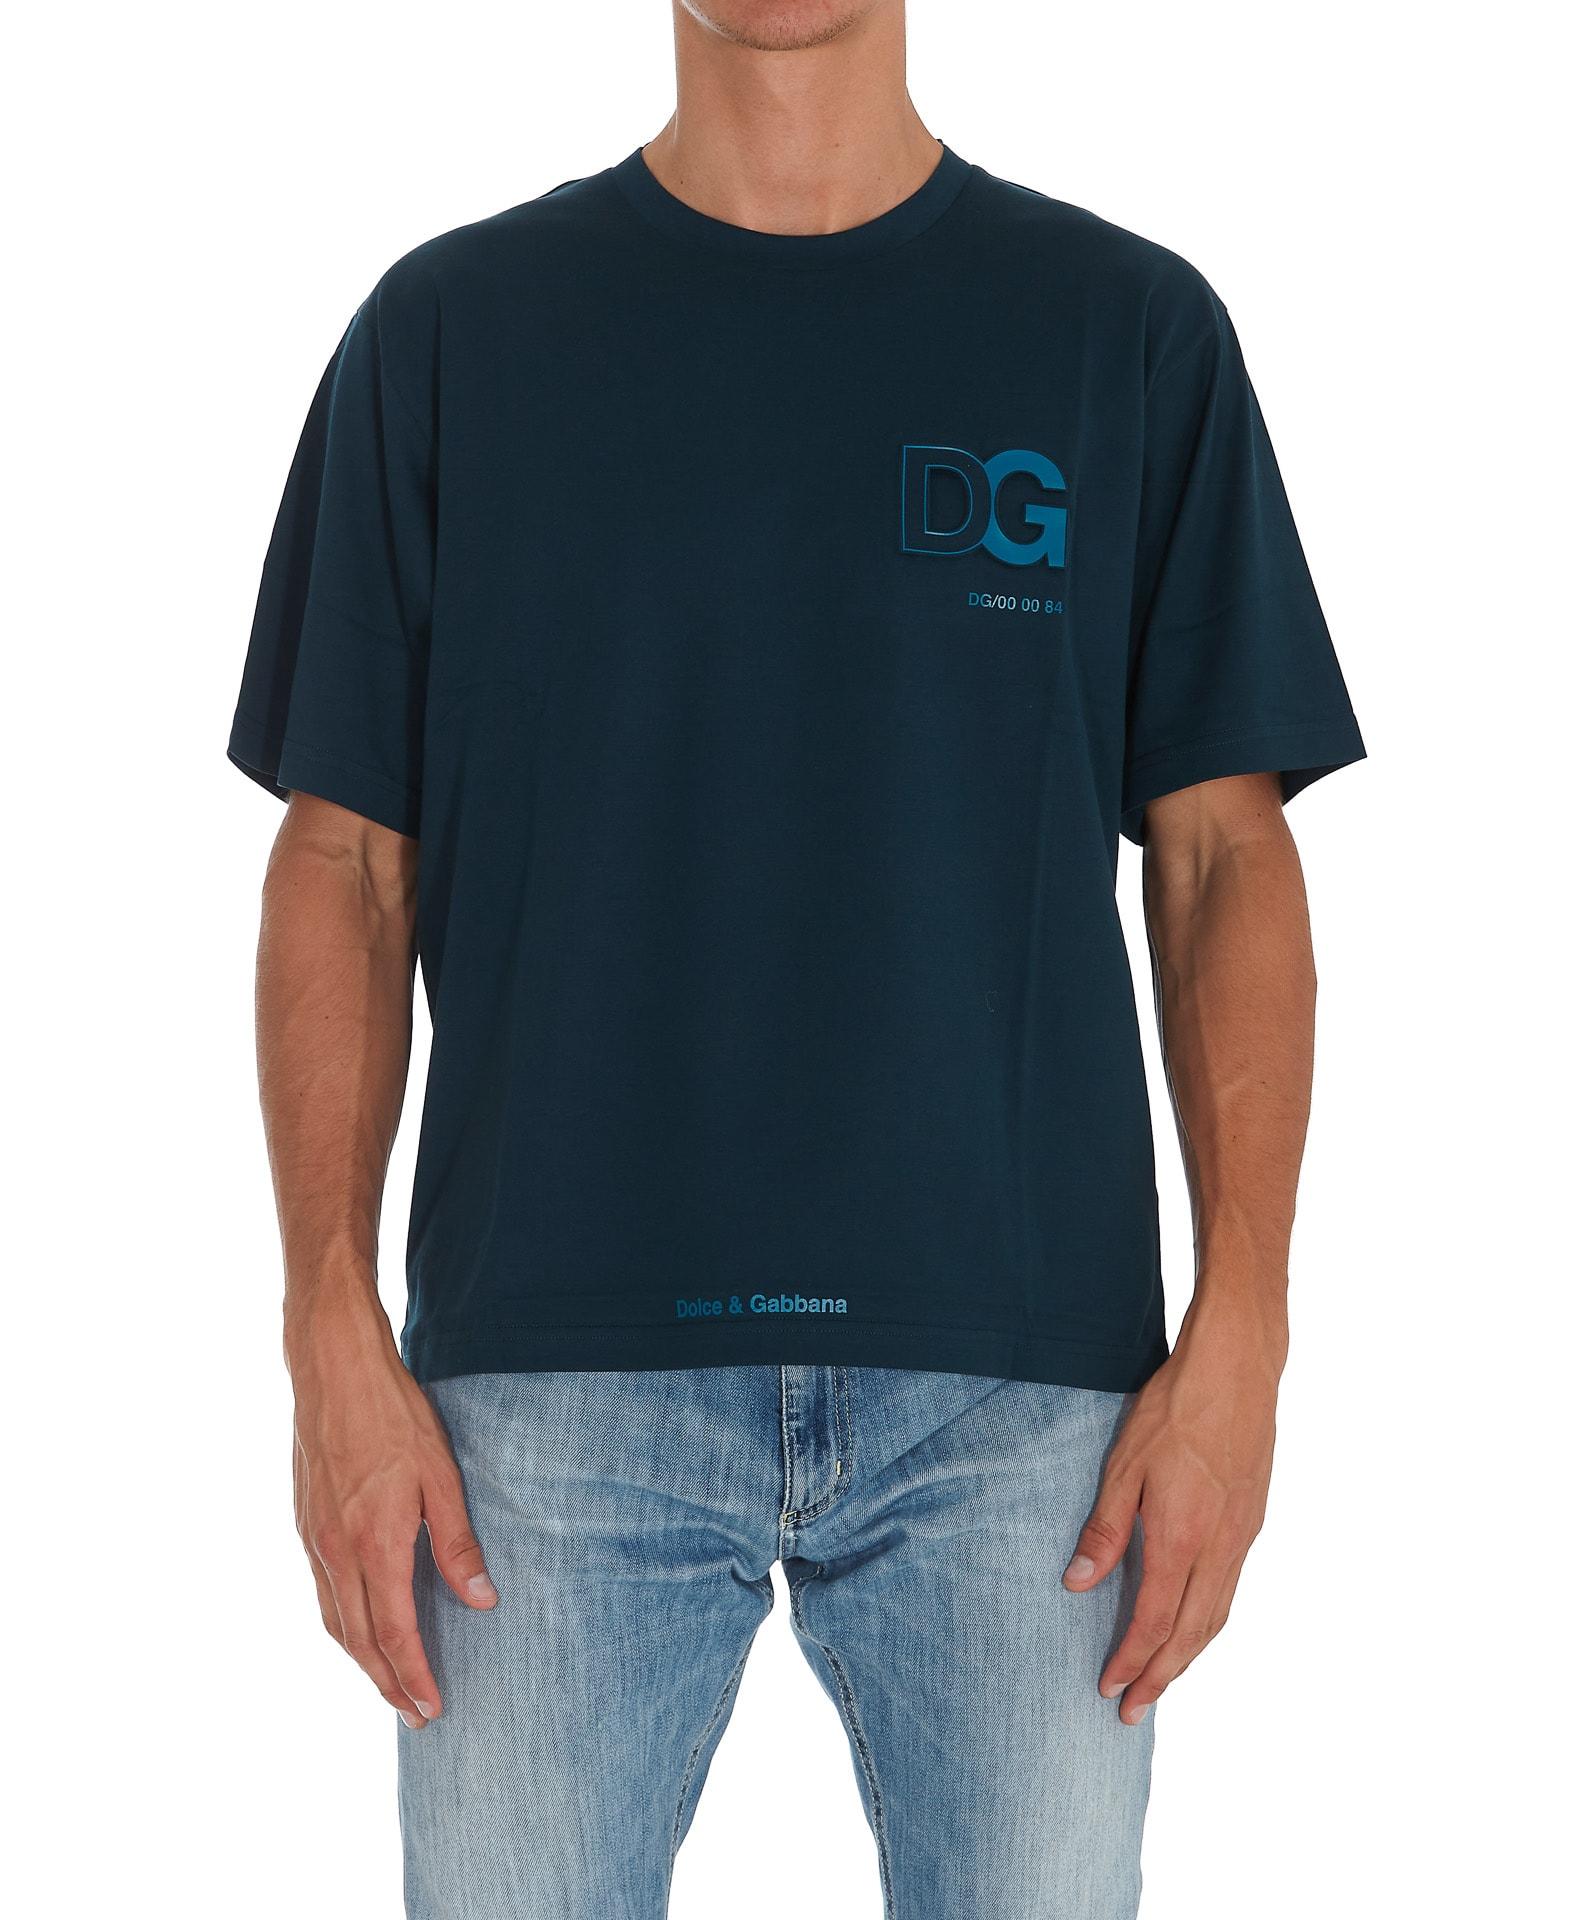 Dolce & Gabbana Tridimensional Dg Logo T-shirt In Blue